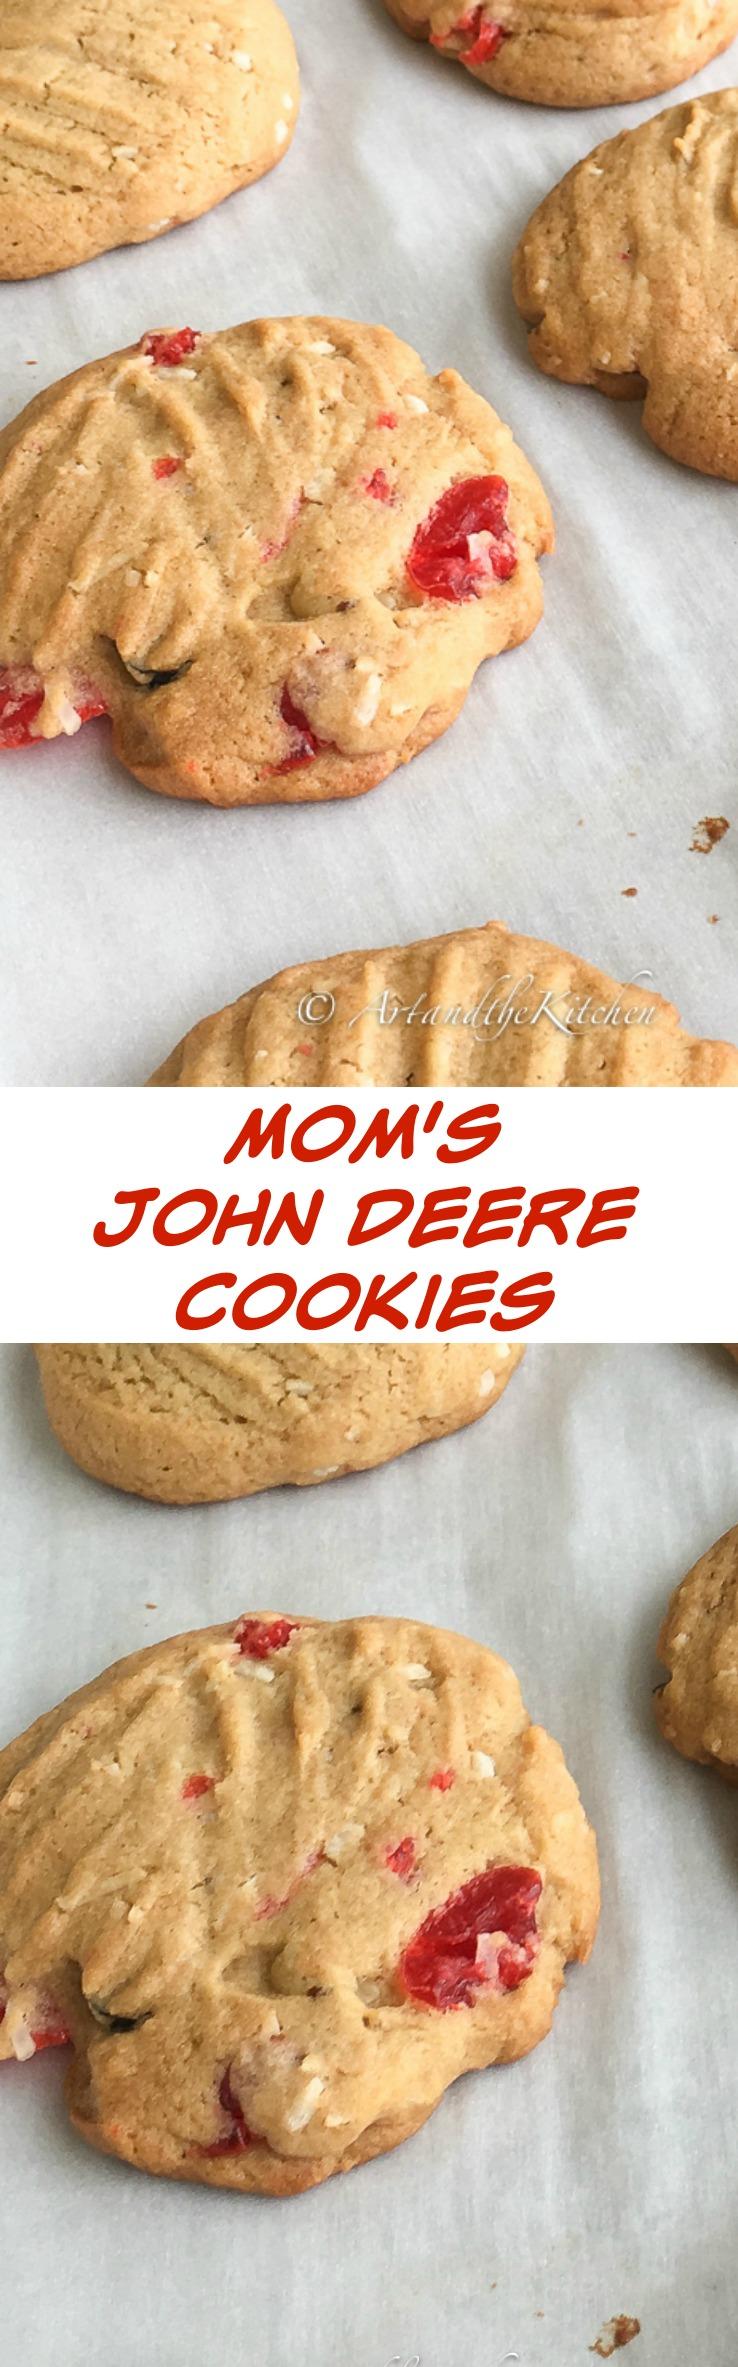 Mom's Cookie recipe, these John Deere cookies combine some great flavours like maraschino cherries, walnuts and coconut. via @artandthekitch